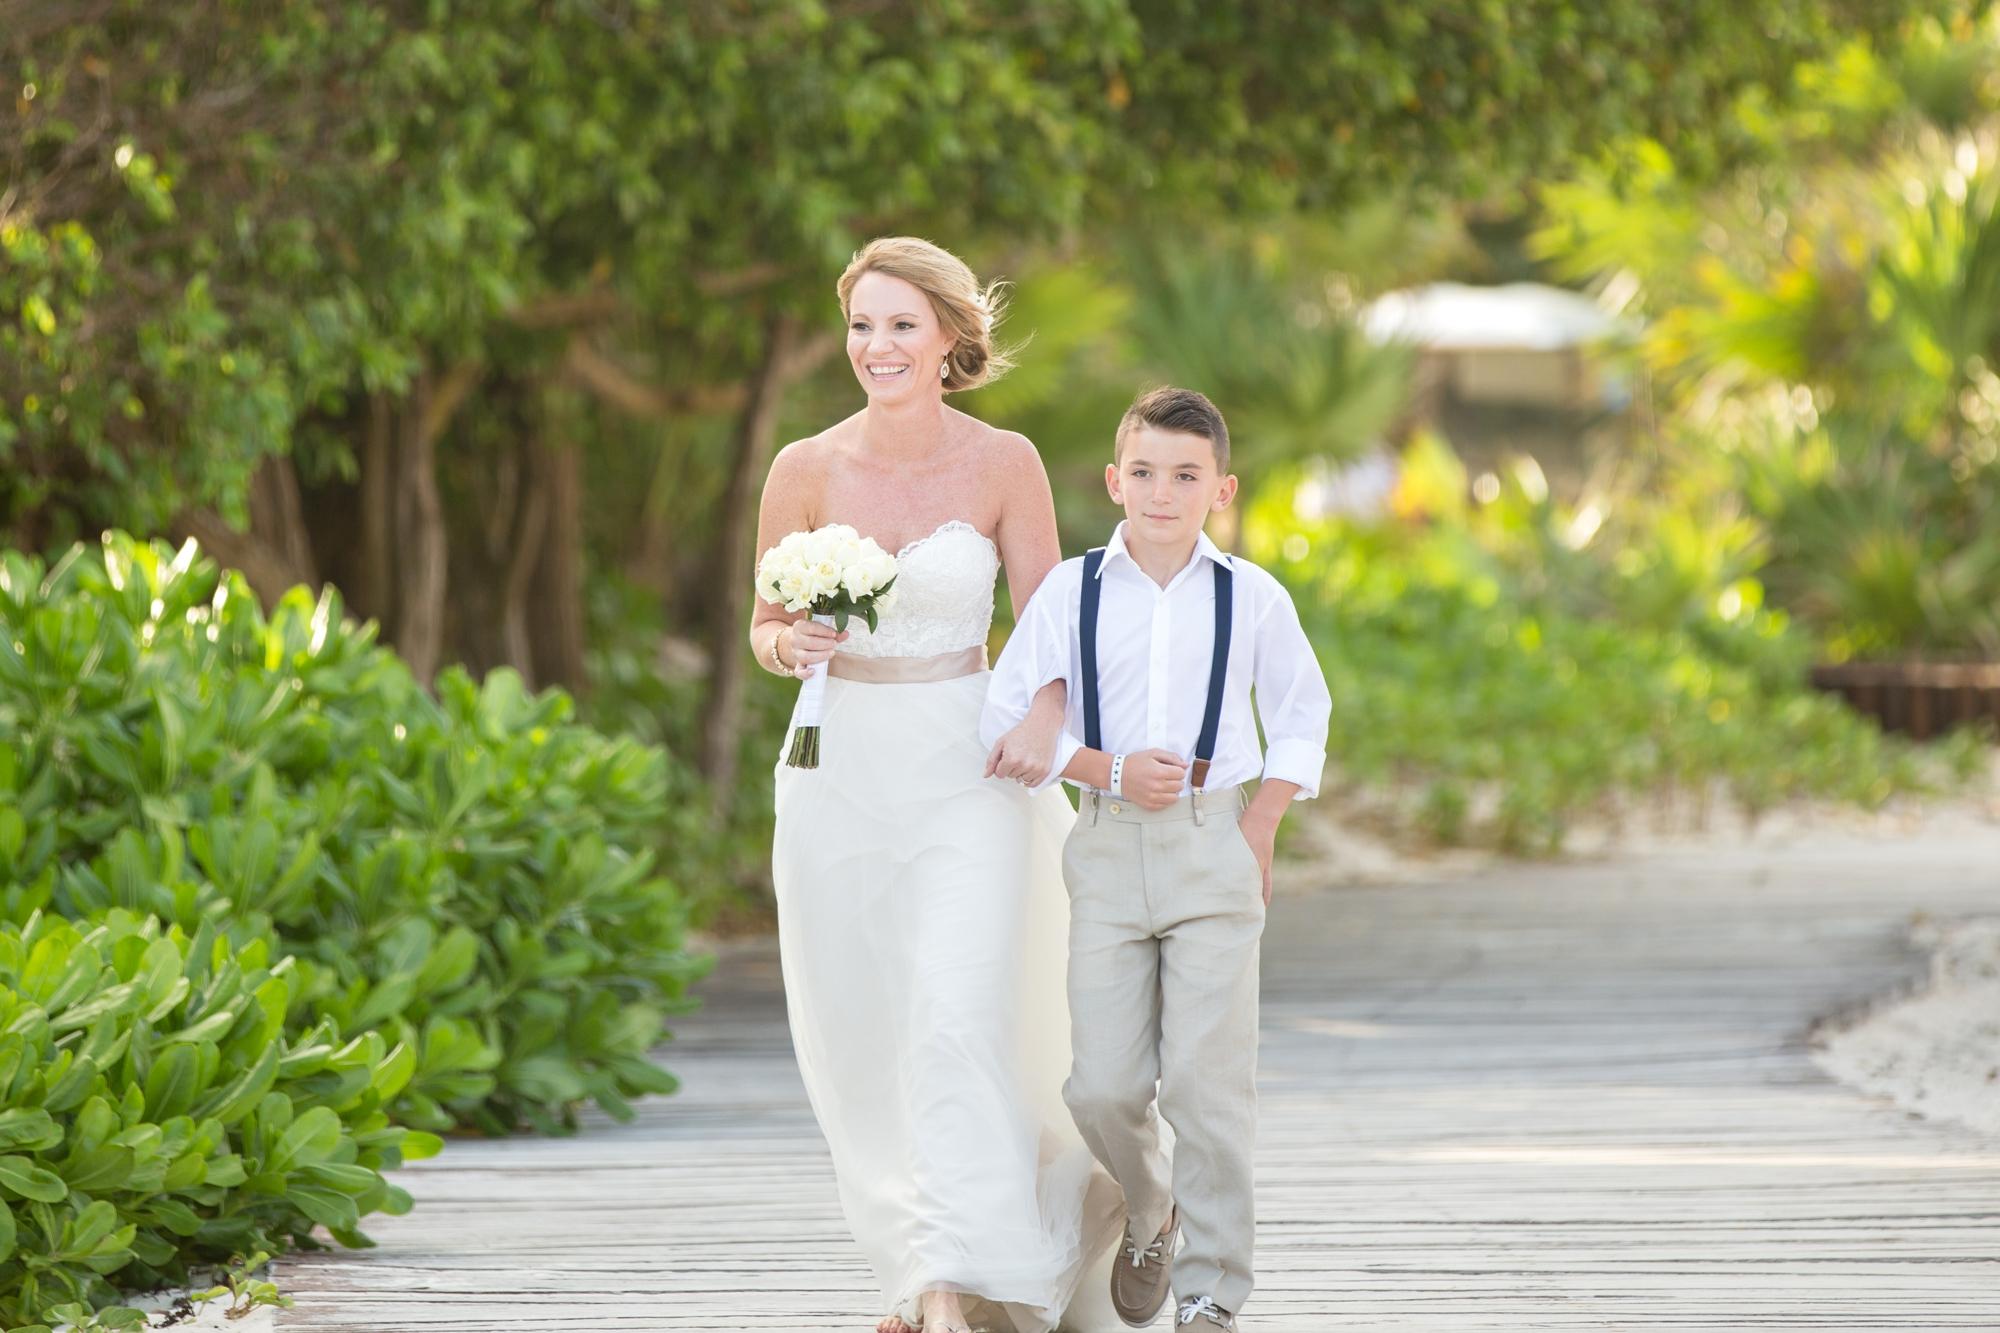 Morosoff Wedding 2-Ceremony-174_anna grace photography destination wedding photographer playa del carmen mexico photo.jpg